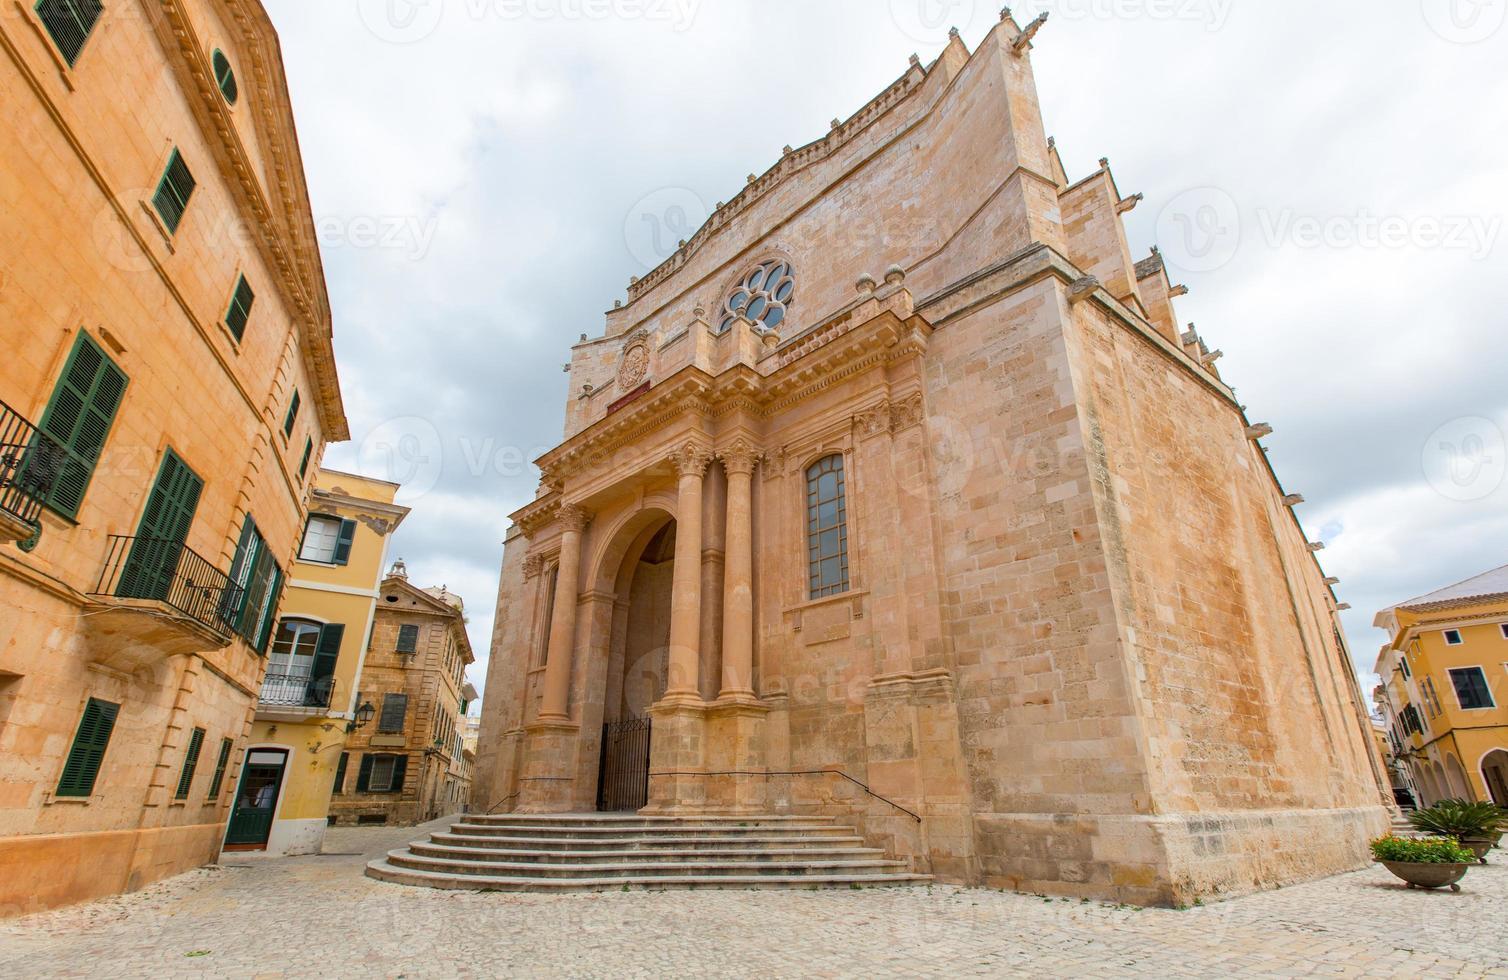 Ciutadella menorca cathédrale à Ciudadela Iles Baléares photo